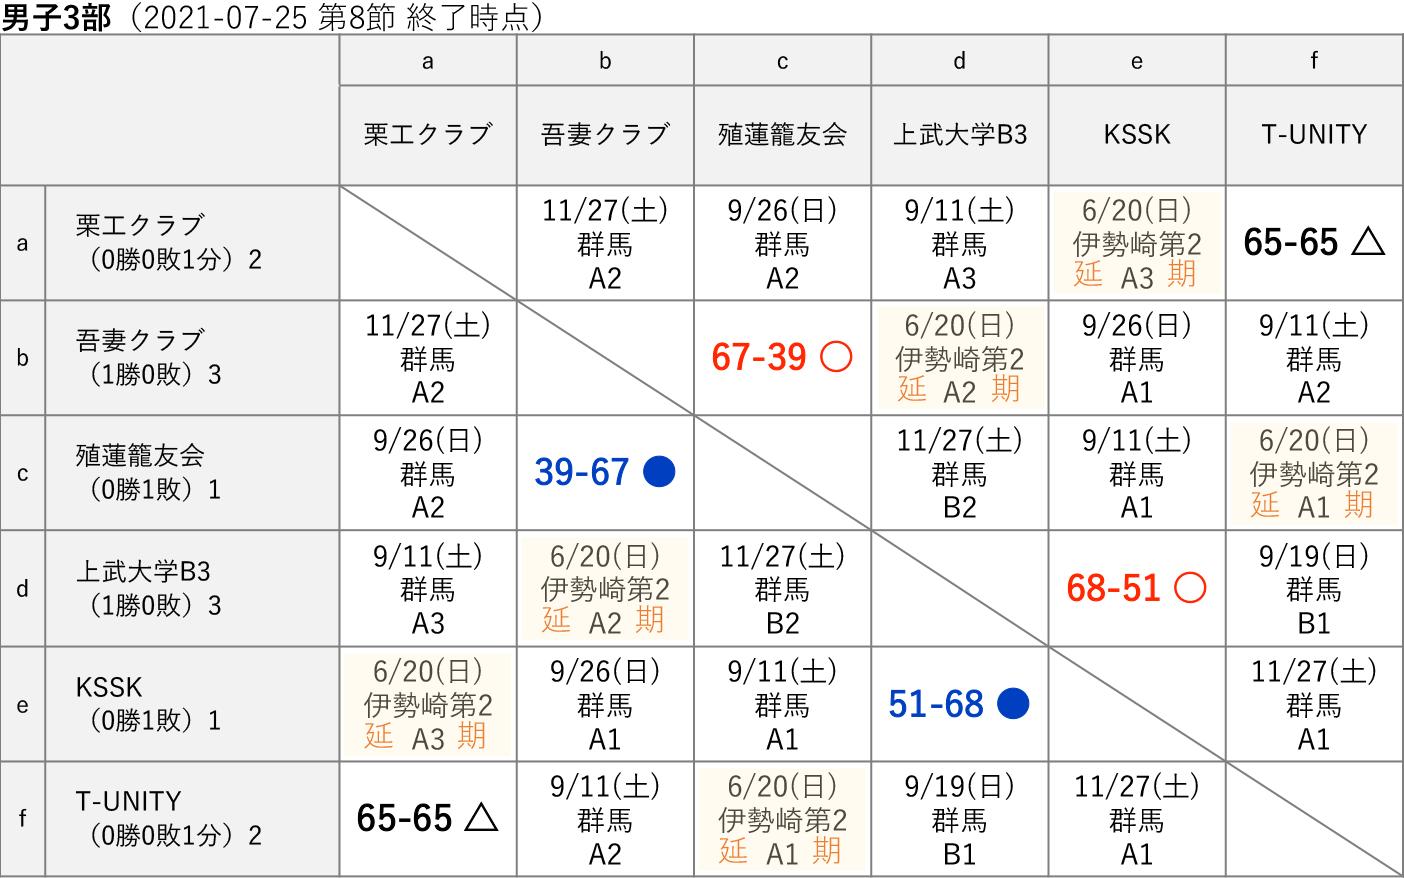 2021社会人リーグ 男子3部 星取り表(2021-07-25 第8節終了時)